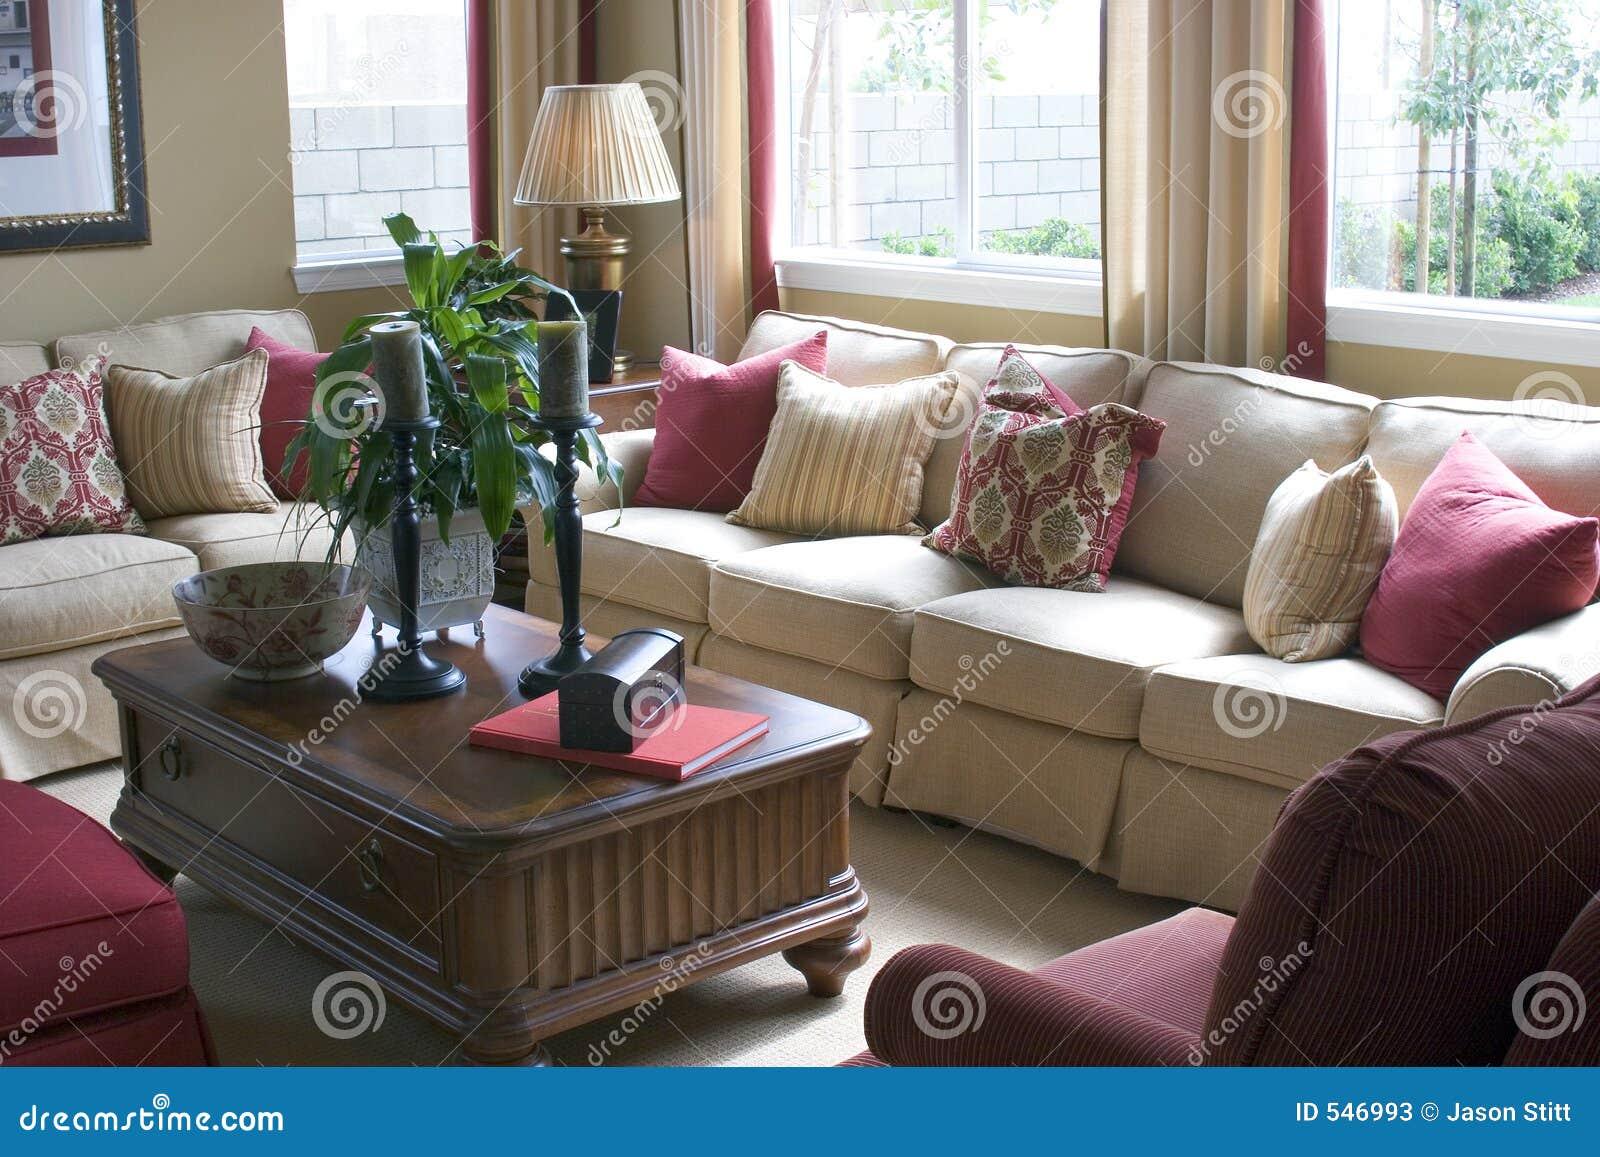 Download 客厅 库存图片. 图片 包括有 装饰, 居住, 房子, 里面, 沙发, 设计, 长沙发, 系列, 内部, 空间 - 546993